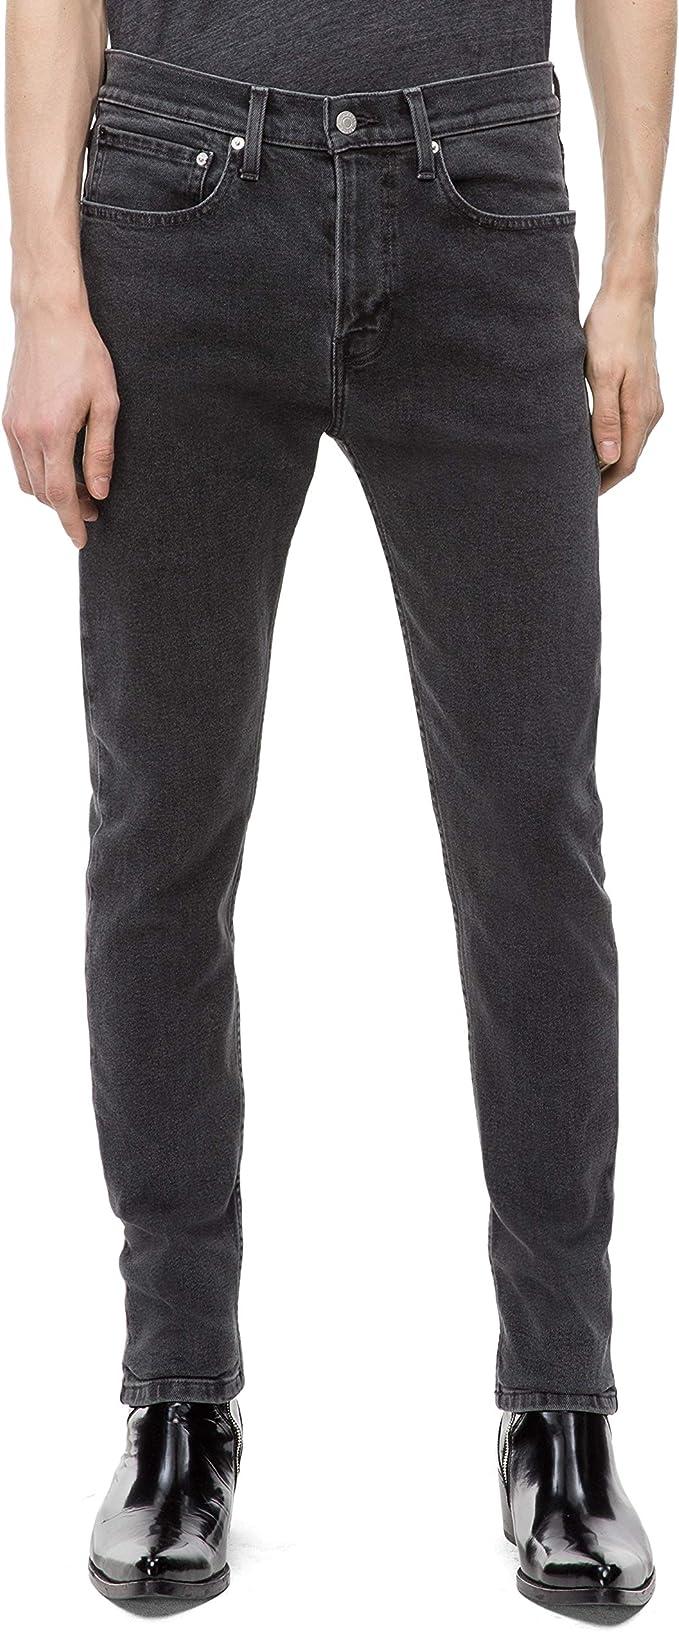 Calvin Klein 卡尔文克莱因 CK 男式紧身牛仔裤 3.8折$29.99 海淘转运到手约¥250